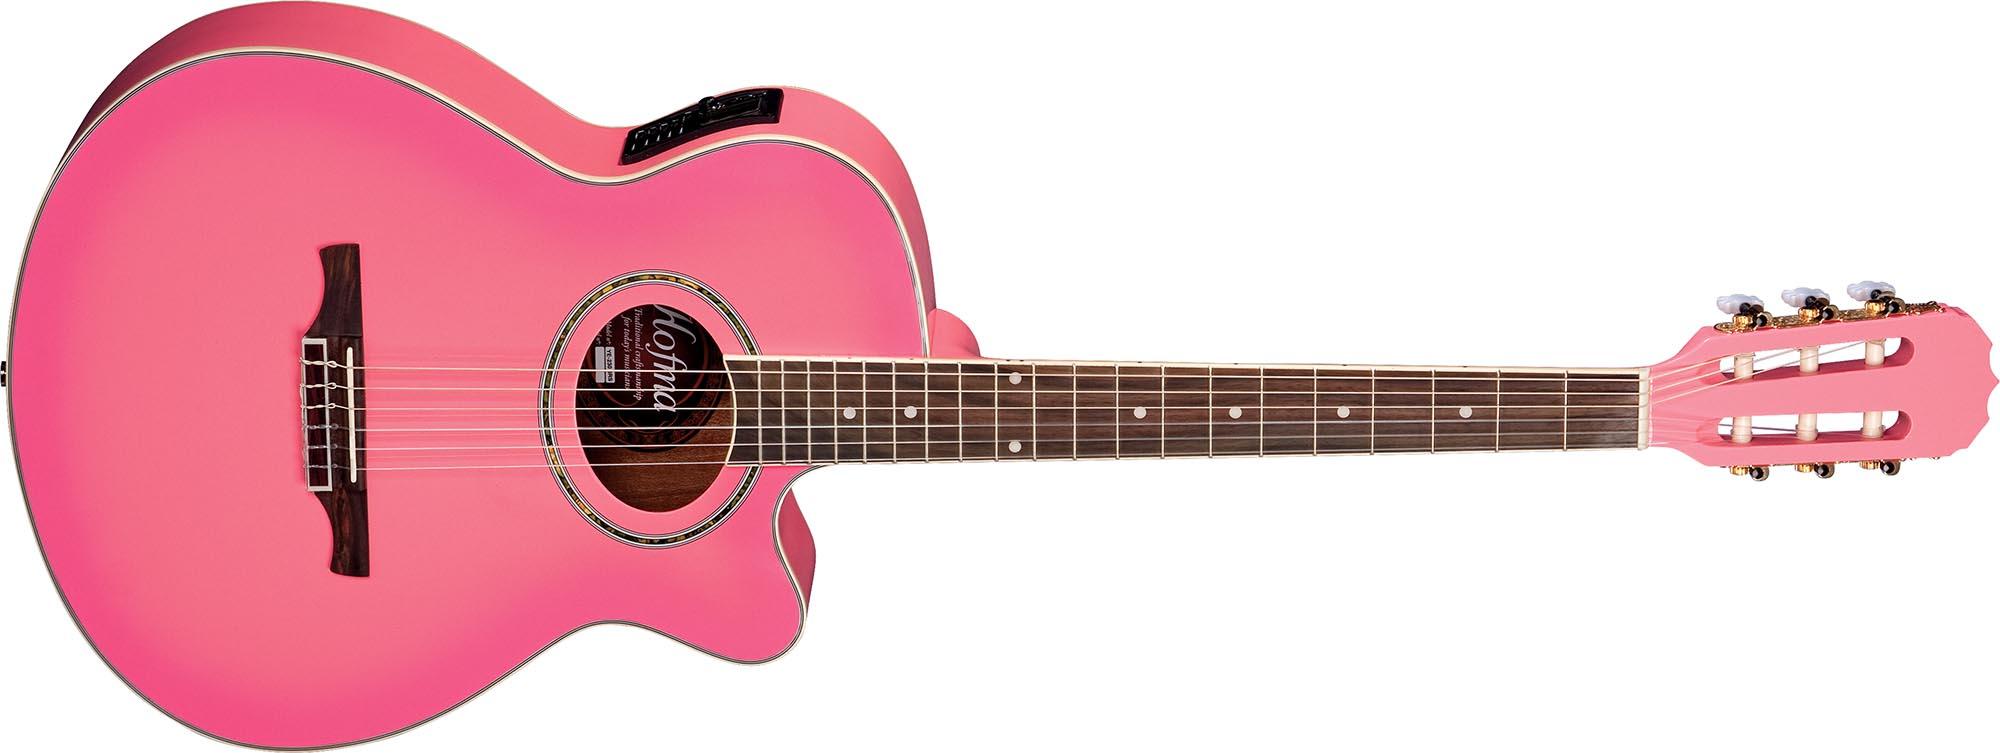 ye230 violao folk mini jumbo eletroacustico cordas de nailon ye230 srs rosa visao frontal